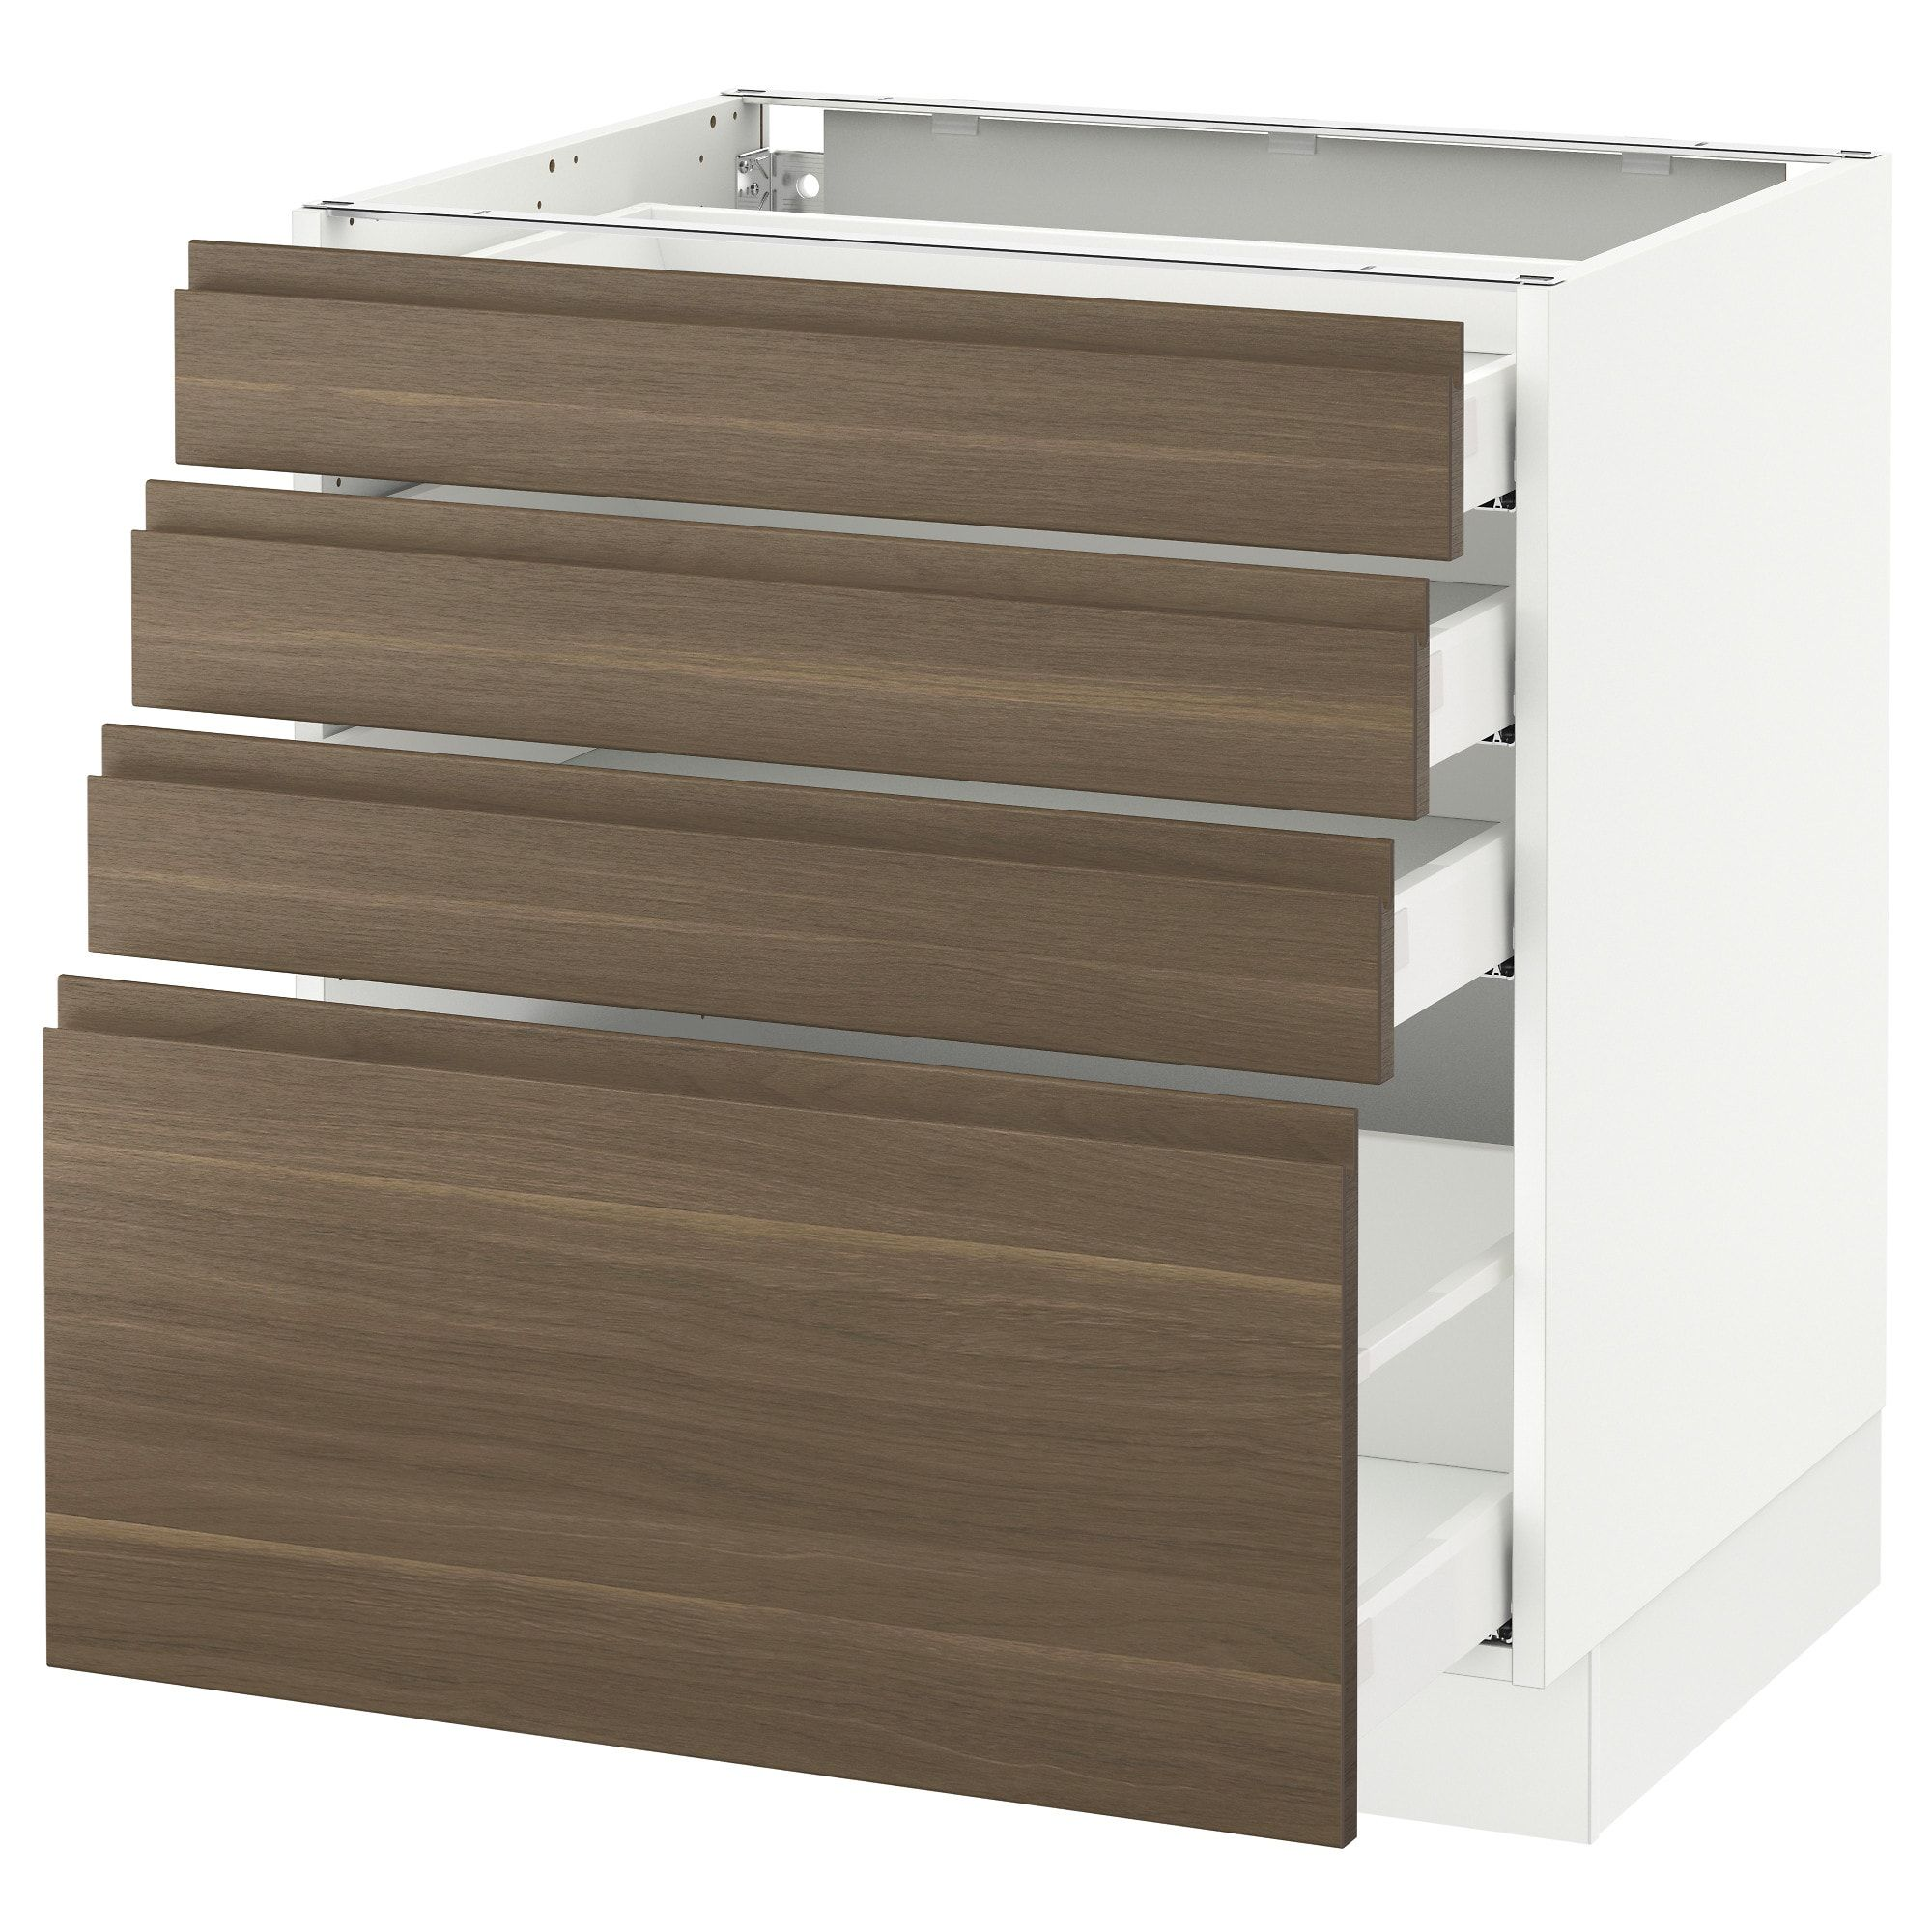 Base Cabinet With 4 Drawers White Maximera Voxtorp Walnut 30x24x30 Base Cabinets Ikea Drawers